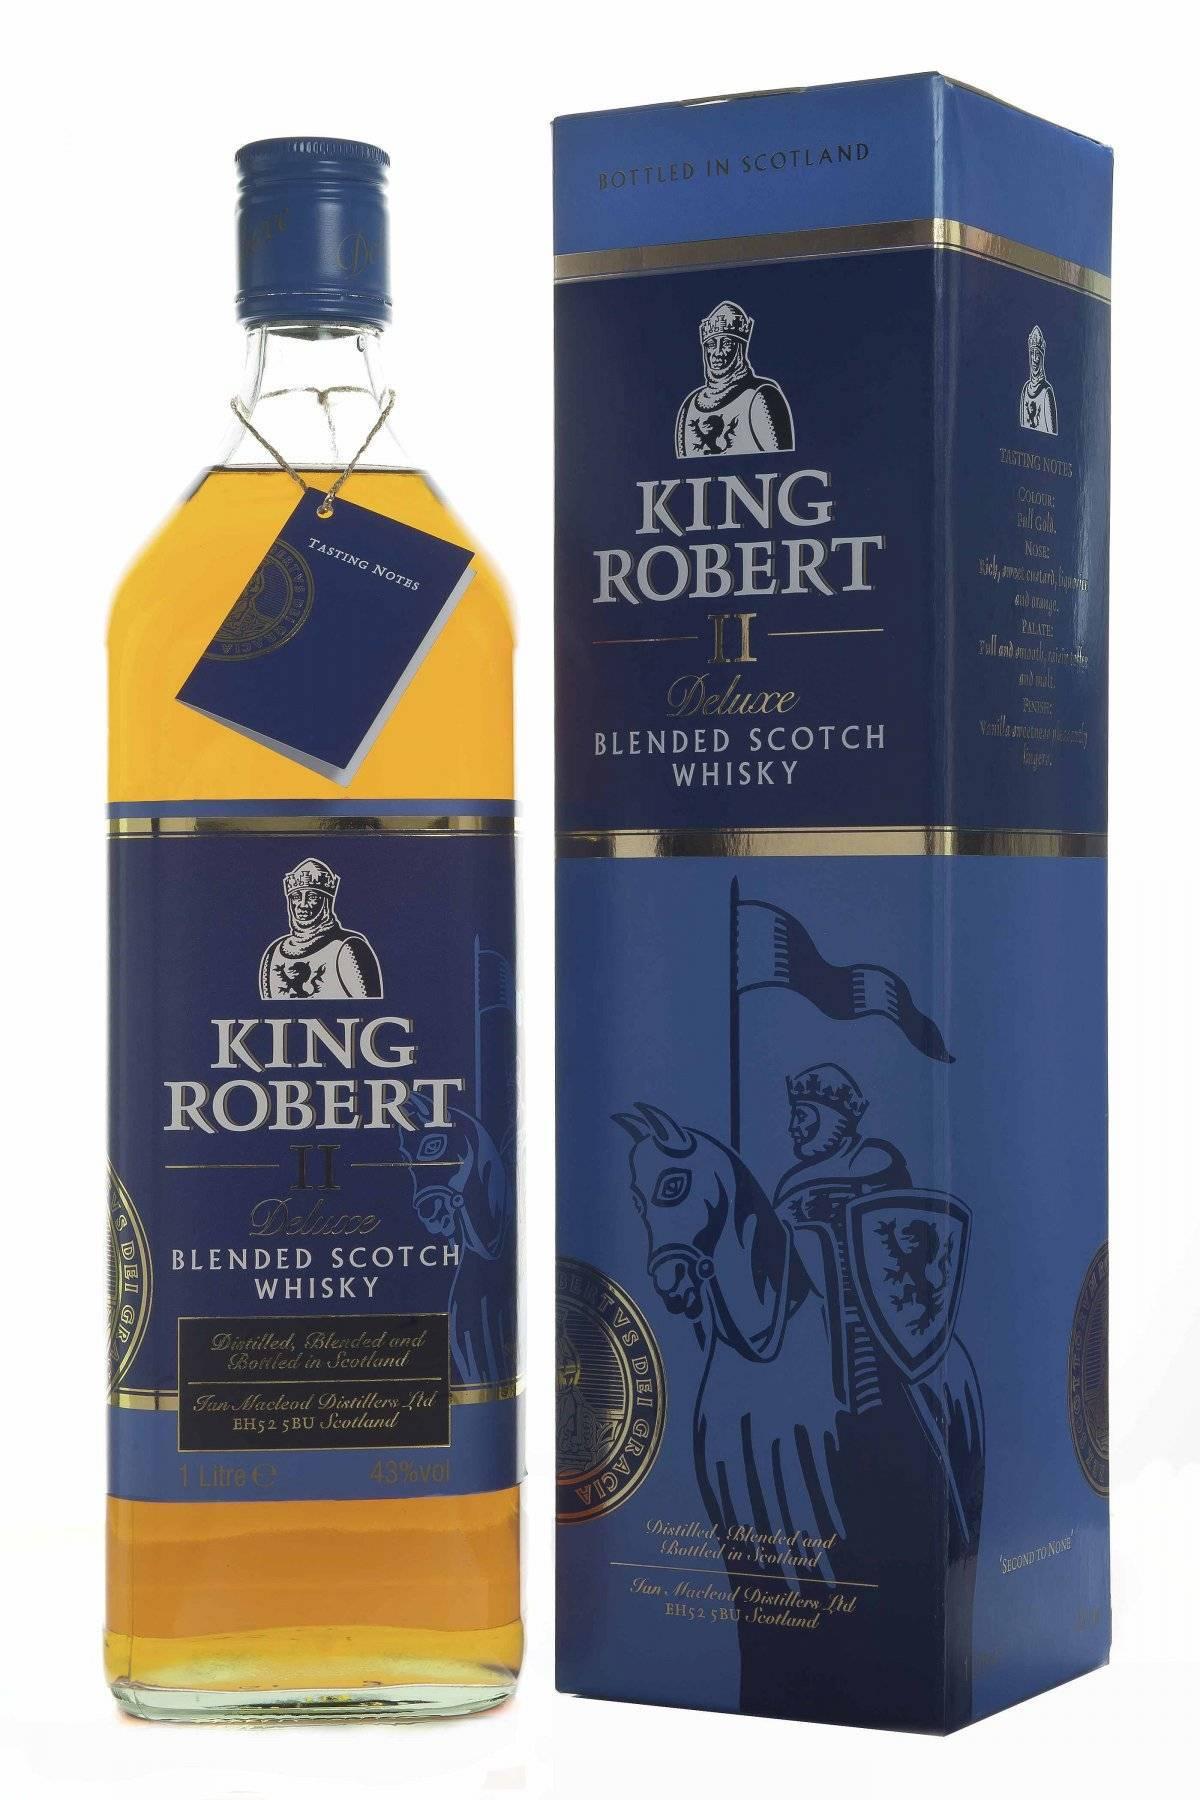 King robert ii (король роберт ii)